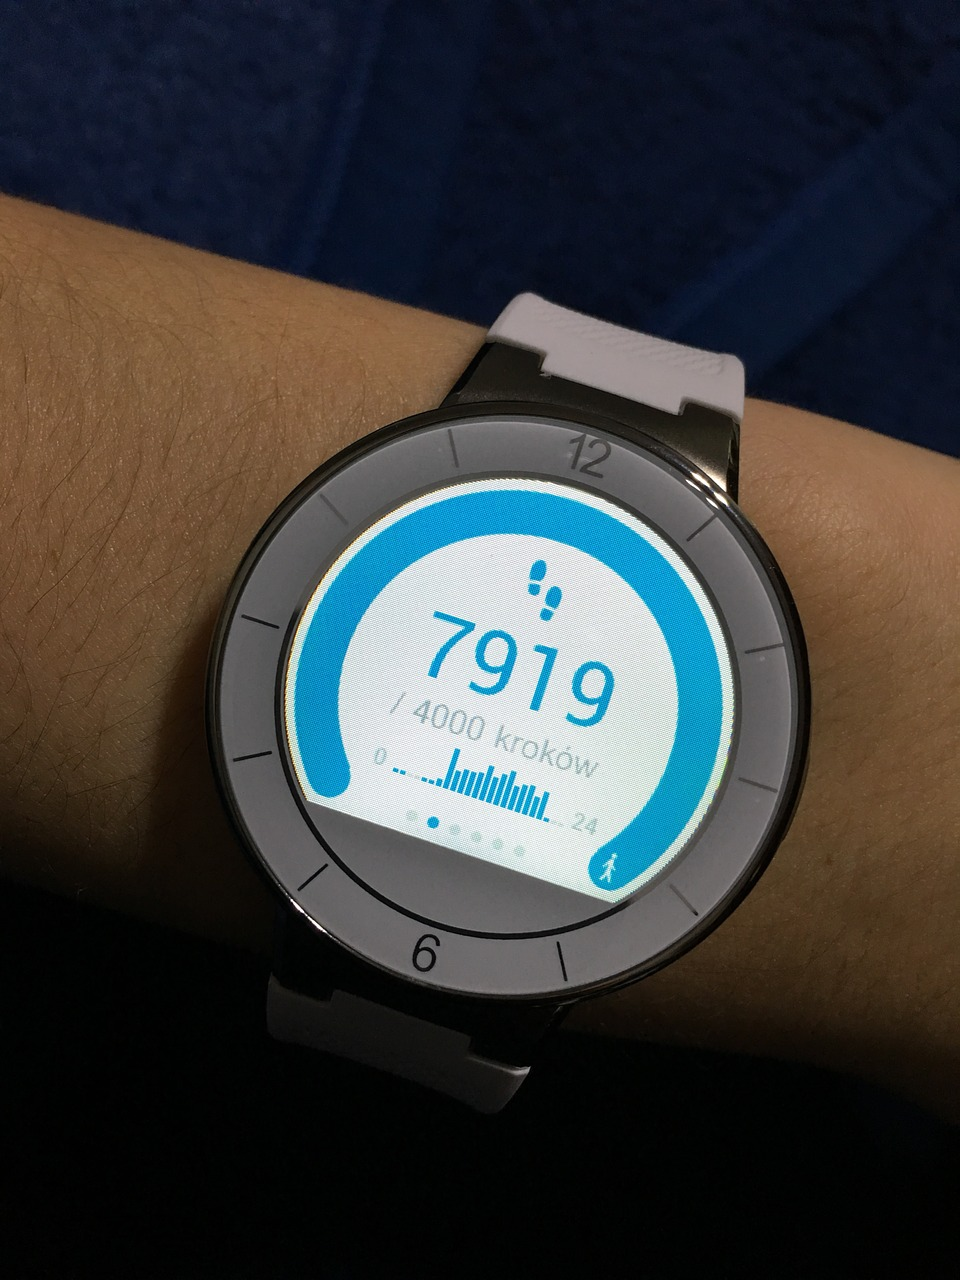 Zainteresowanie smartwatchami